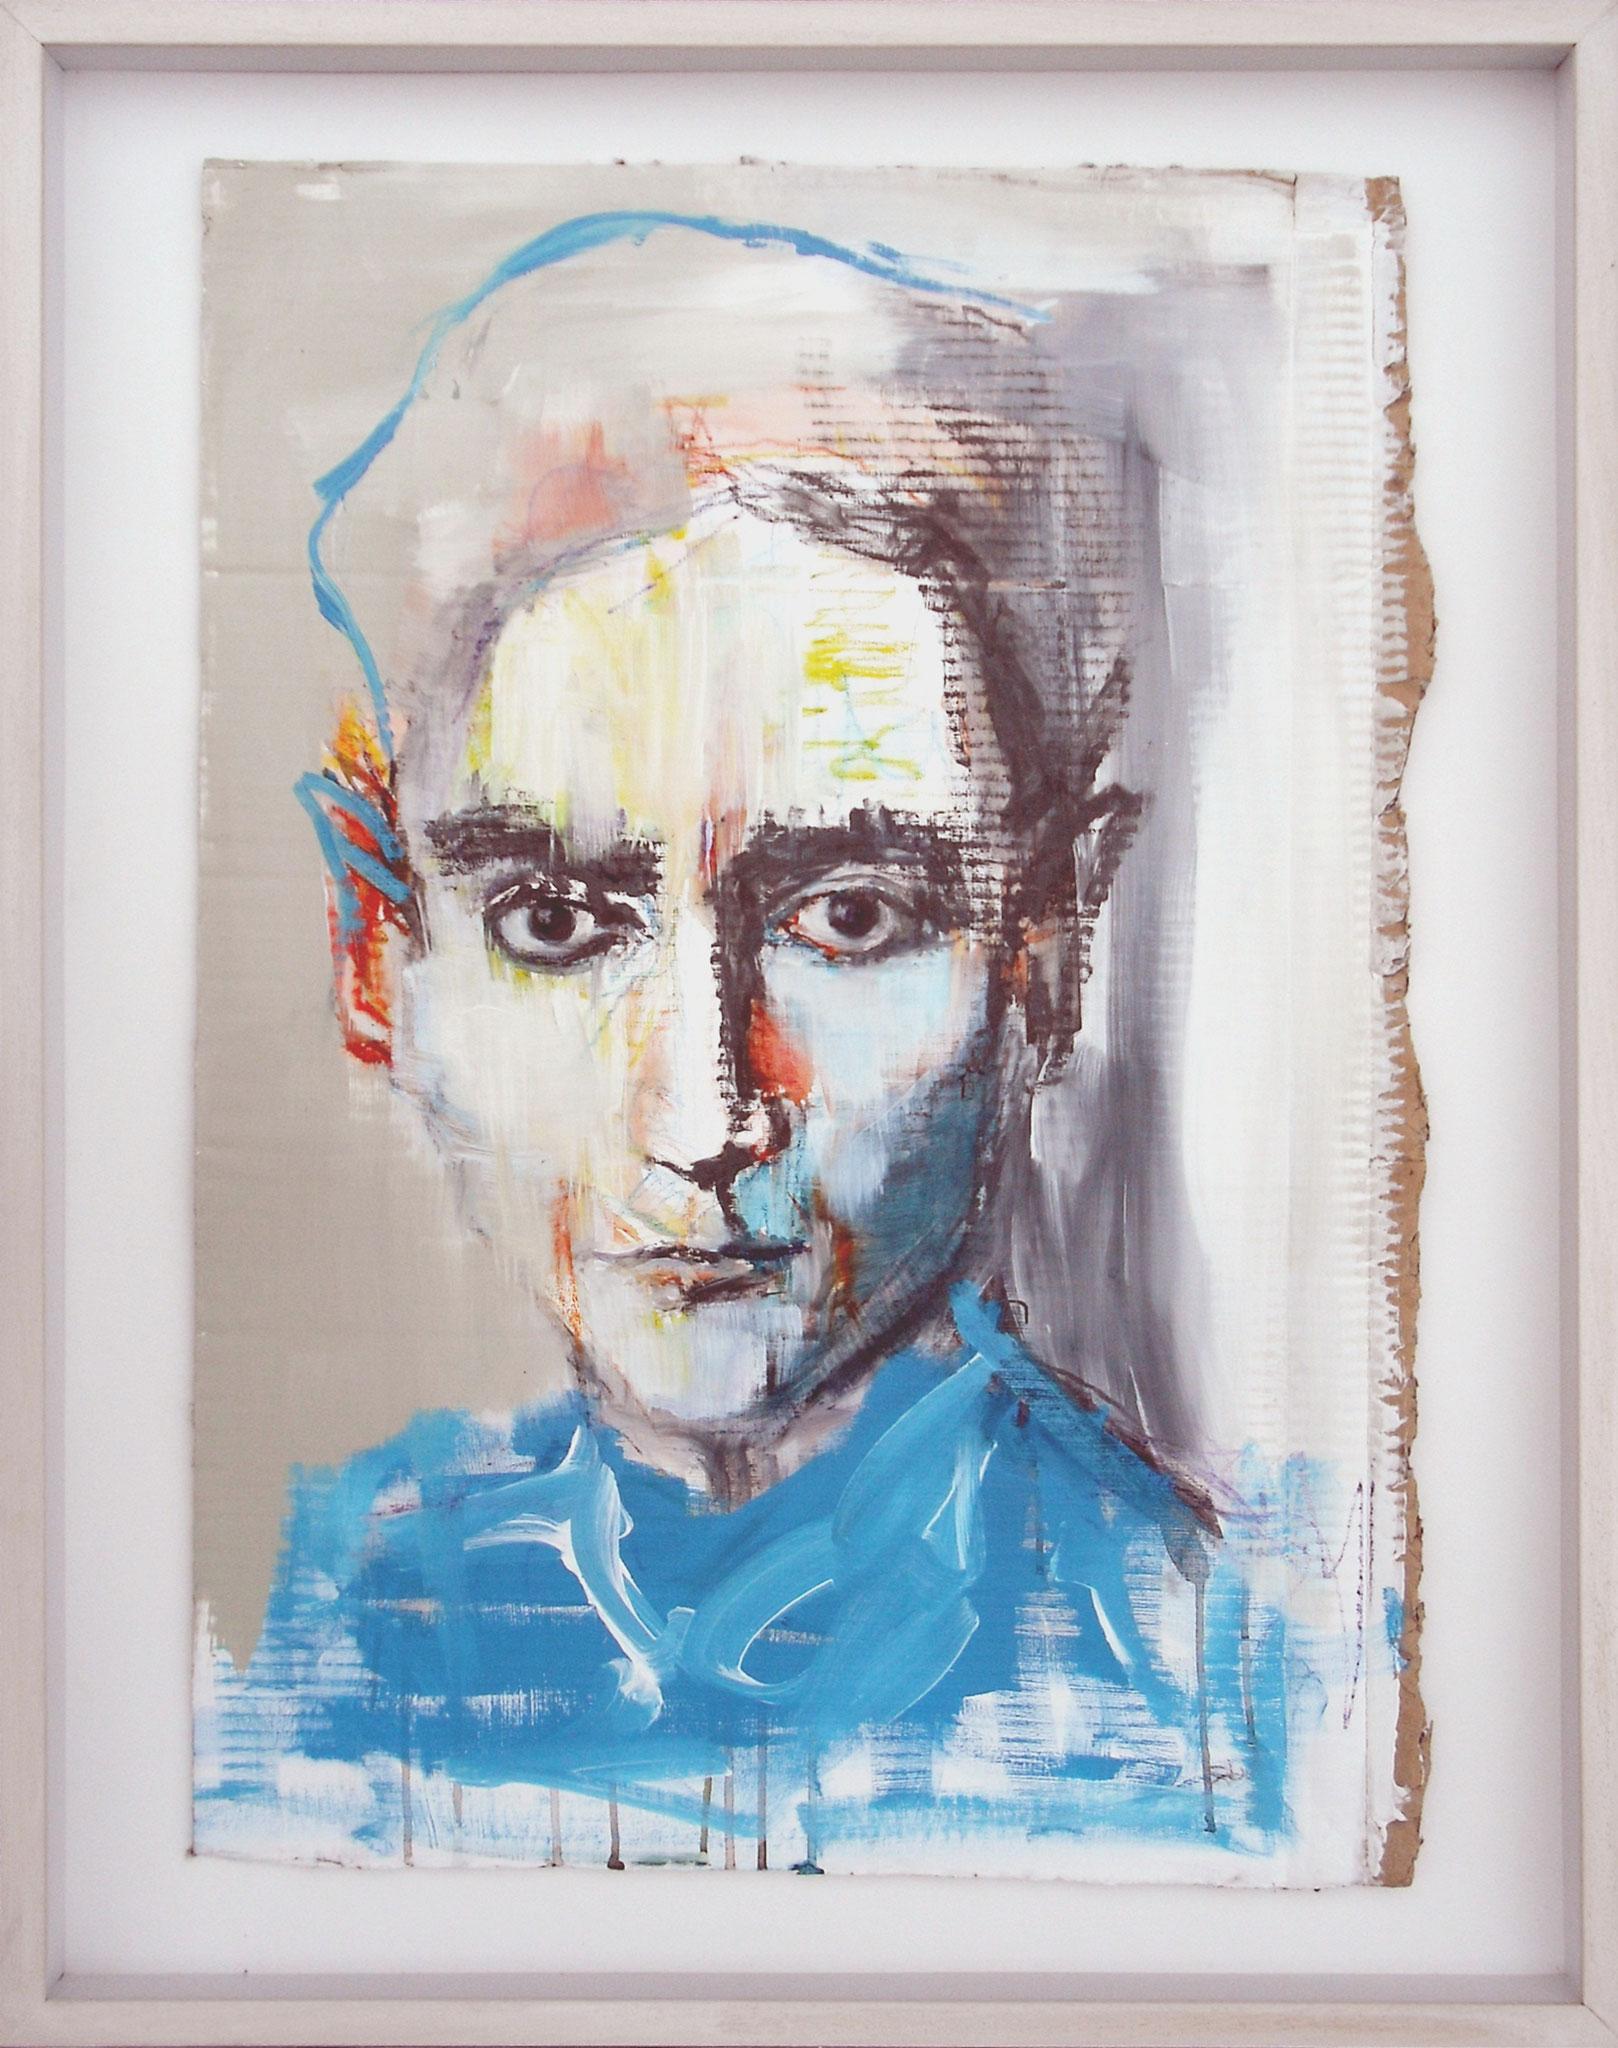 Kafka (Gesso, Graphite, Wax pastel and Acrylic on Cardboard, 77x52cm)